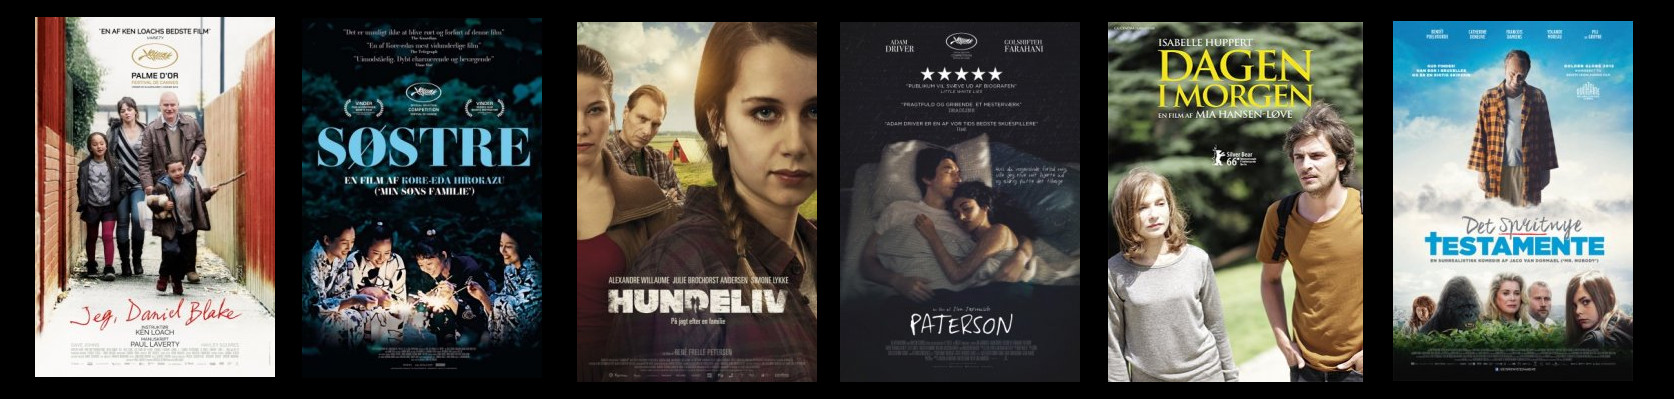 filmer som kommer i 2018